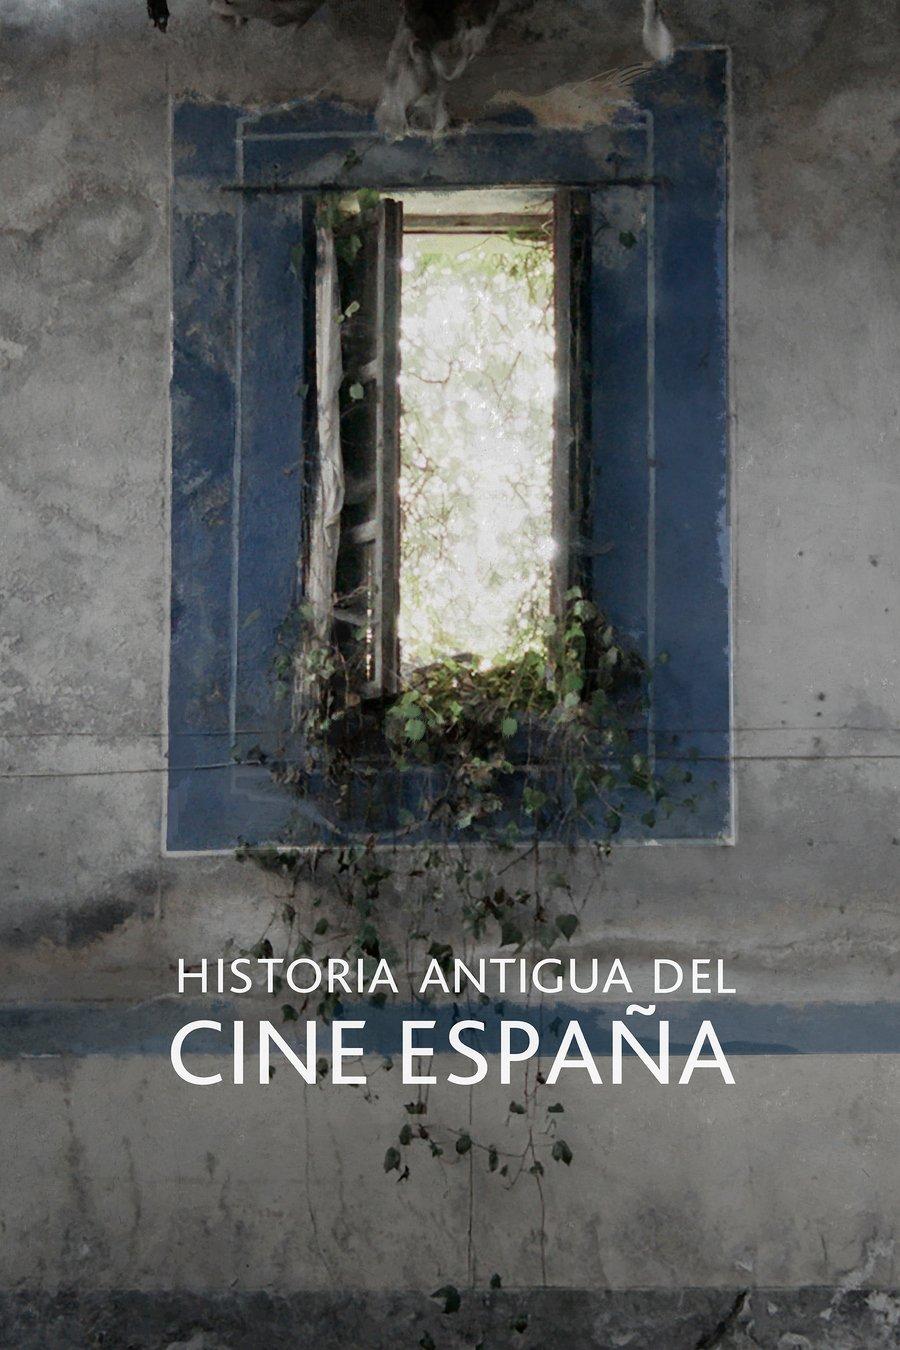 Historia Antigua del Cine España